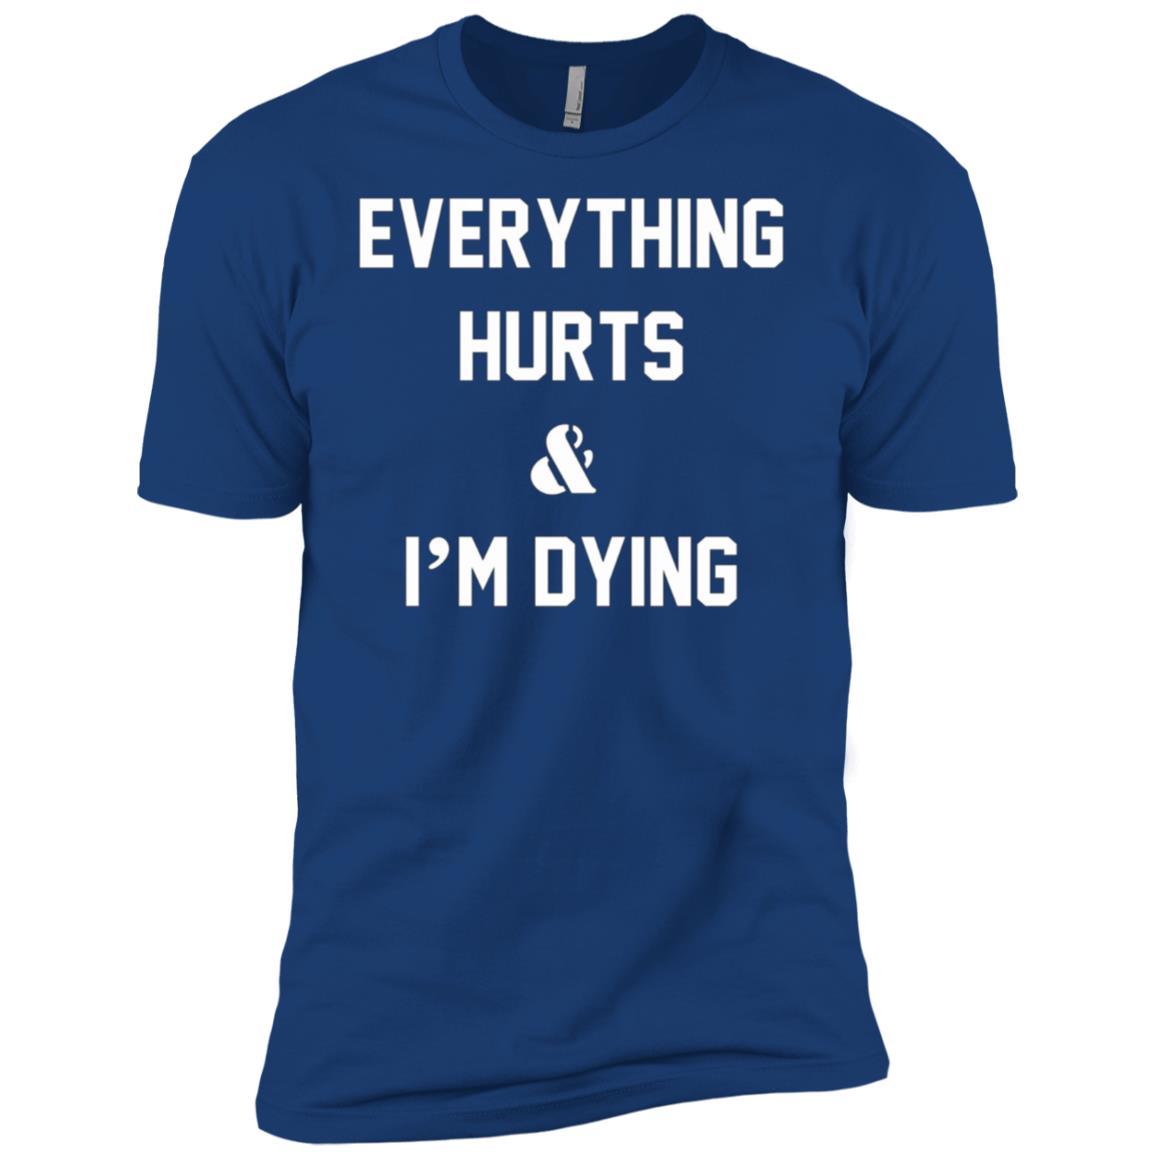 Everything Hurts & I'm Dying – Workout Men Short Sleeve T-Shirt